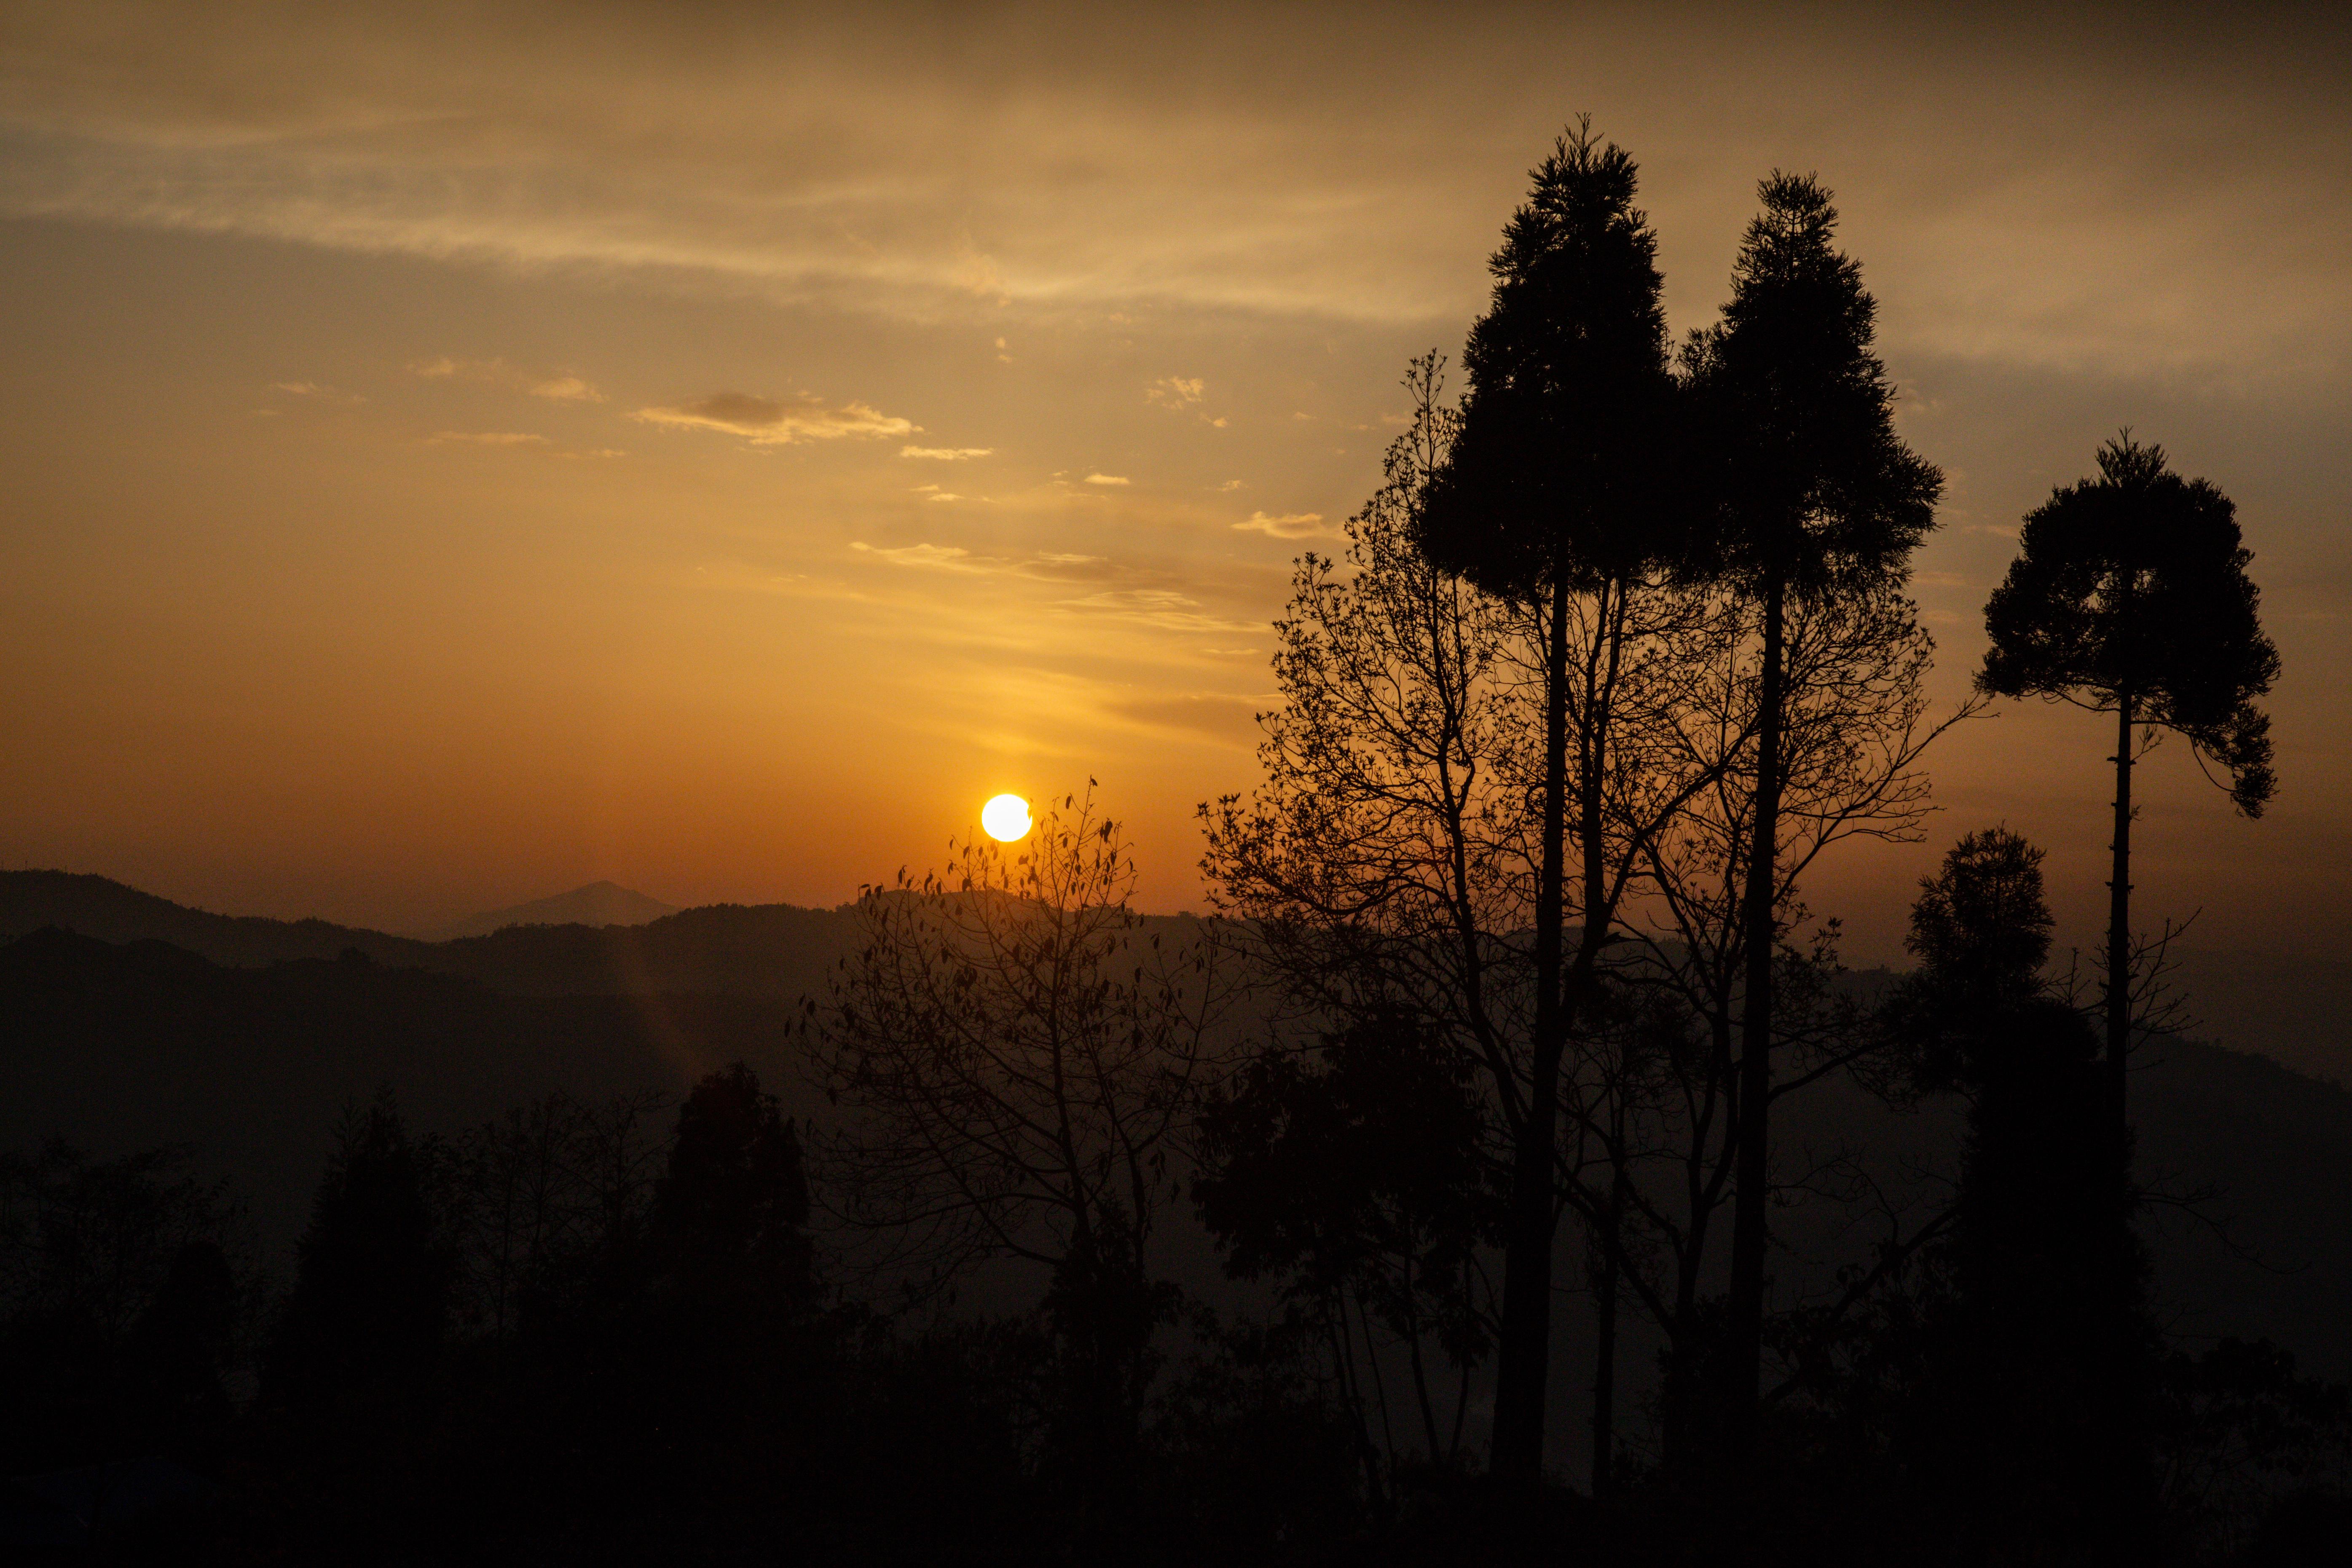 Shree Antu Sunrise